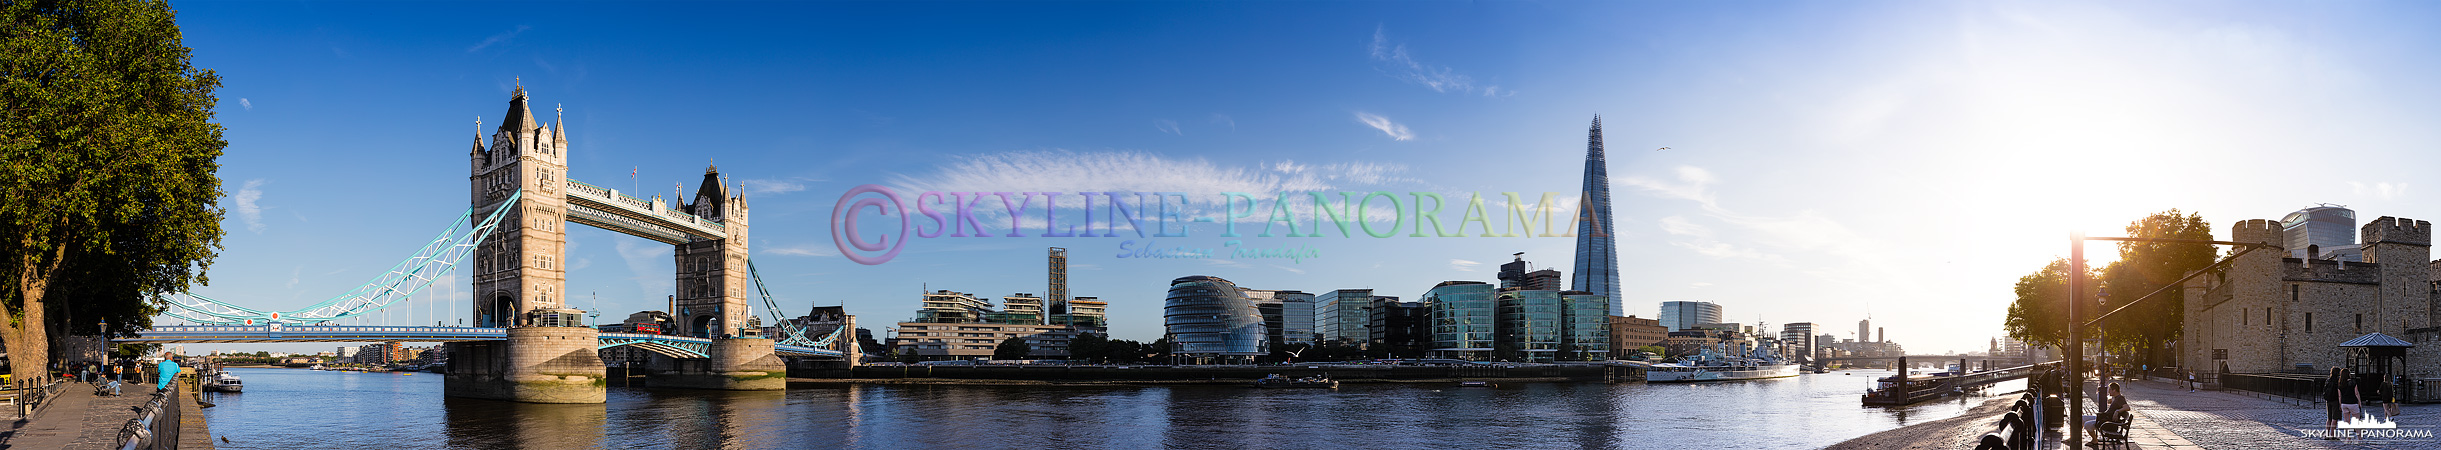 Tower Bridge - Panorama London